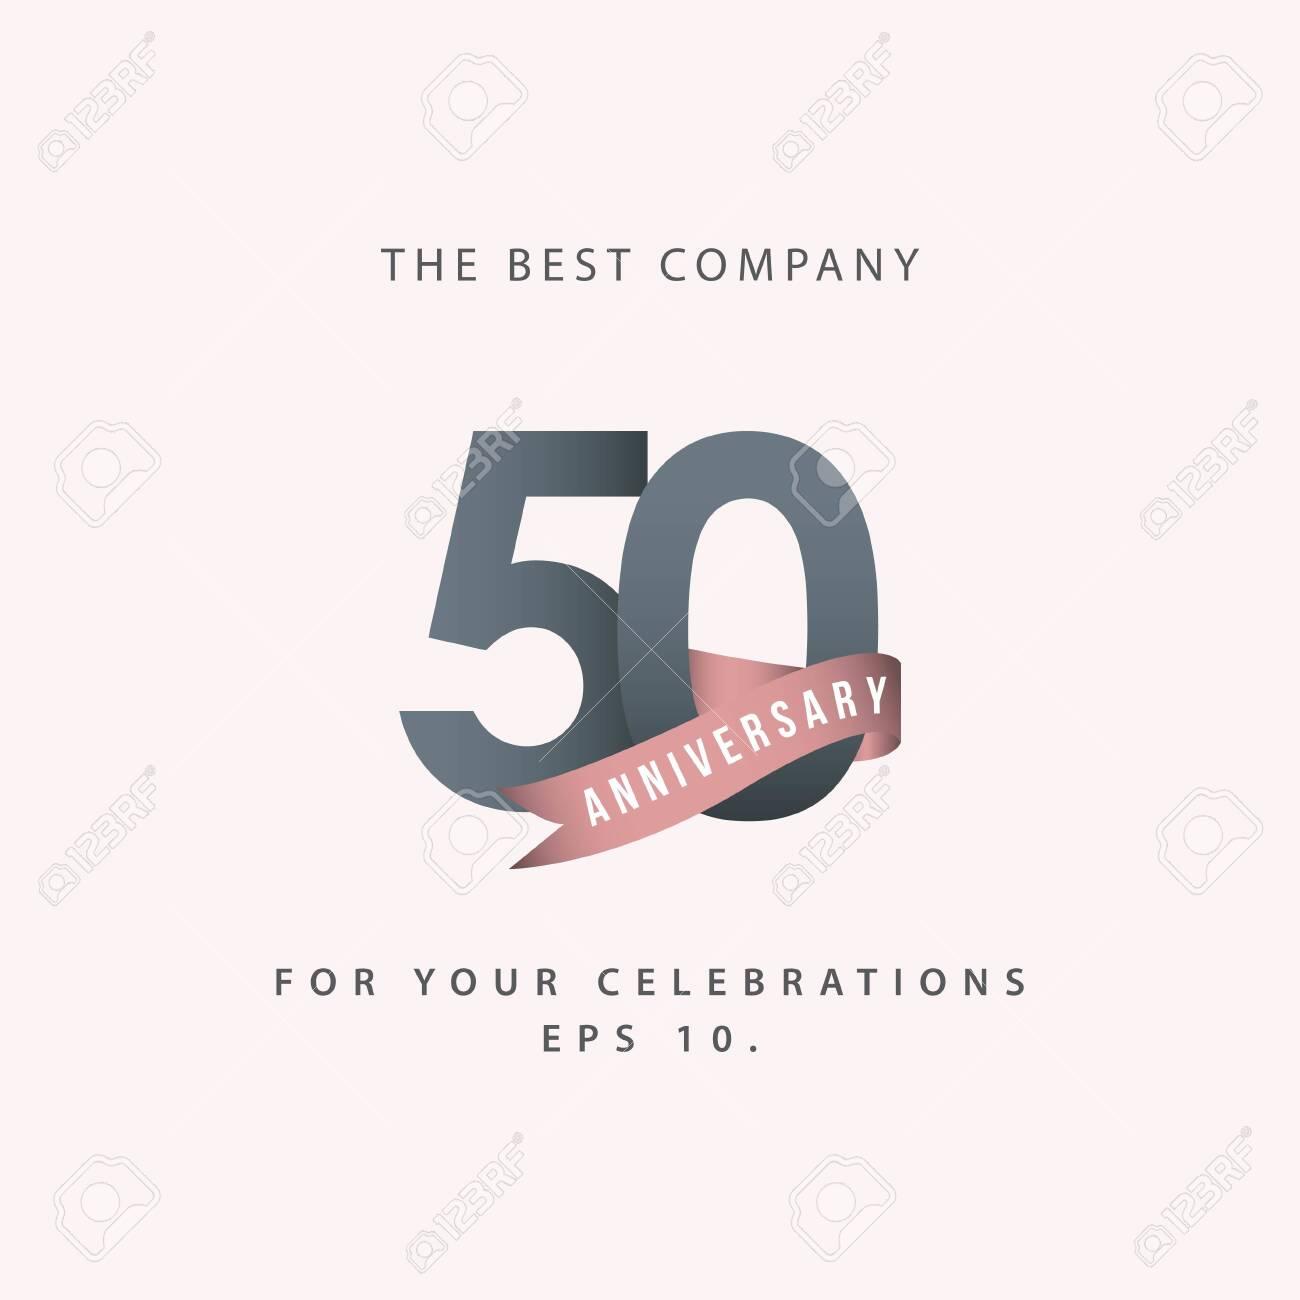 50 Year Anniversary Celebration Vector Template Design Illustration - 119205523